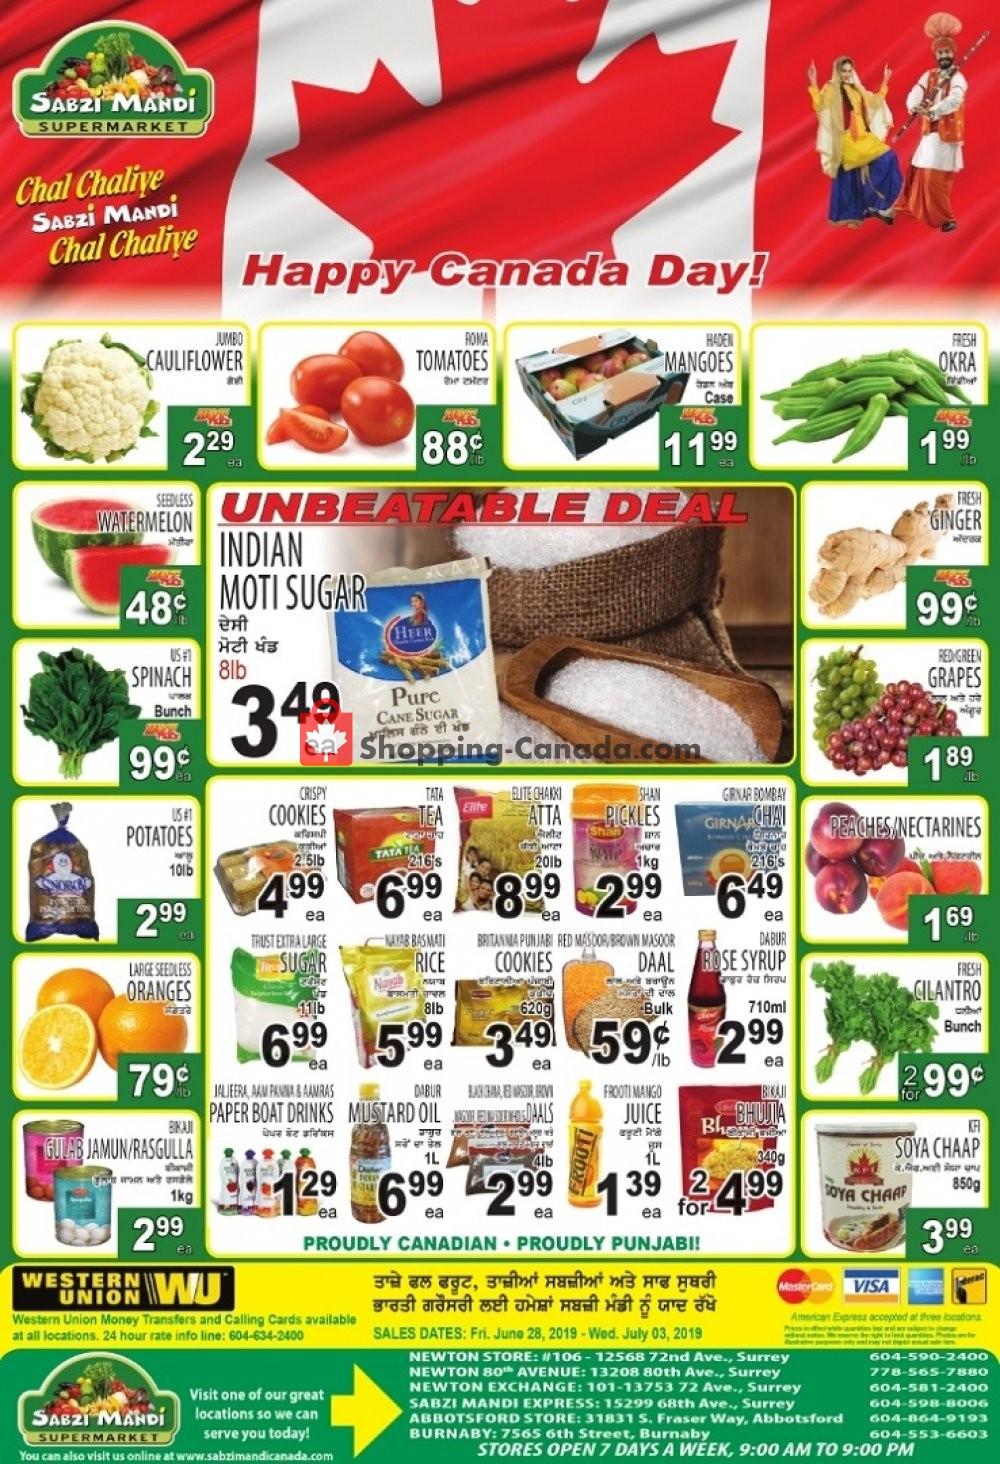 Flyer Sabzi Mandi Supermarket Canada - from Friday June 28, 2019 to Wednesday July 3, 2019